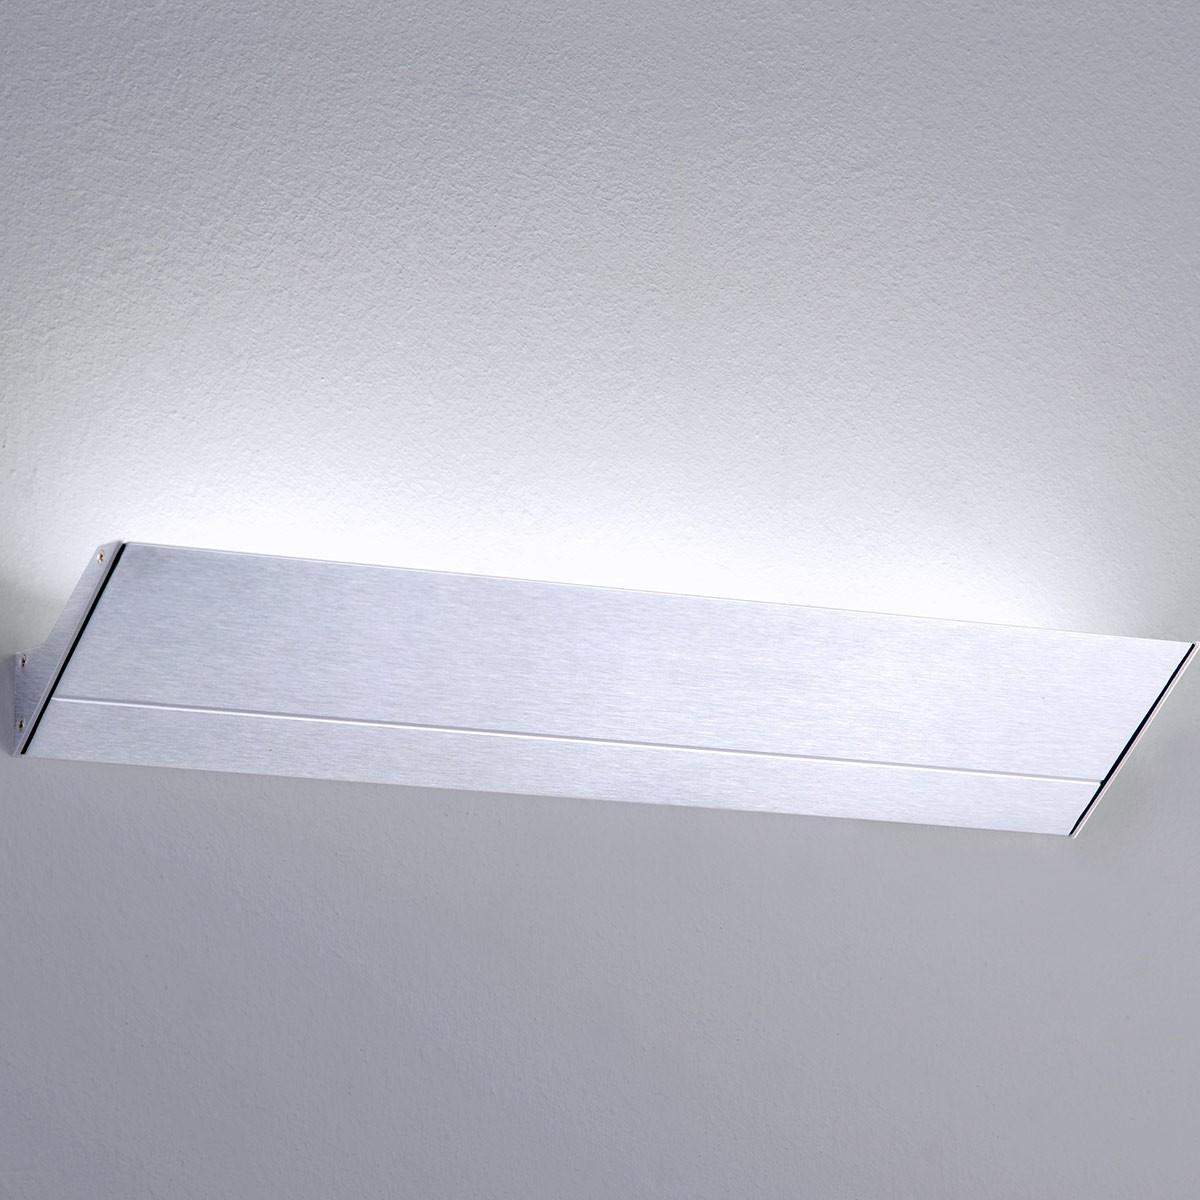 Milan Mini Neva Wandleuchte LED, 3-flg., Alu satiniert